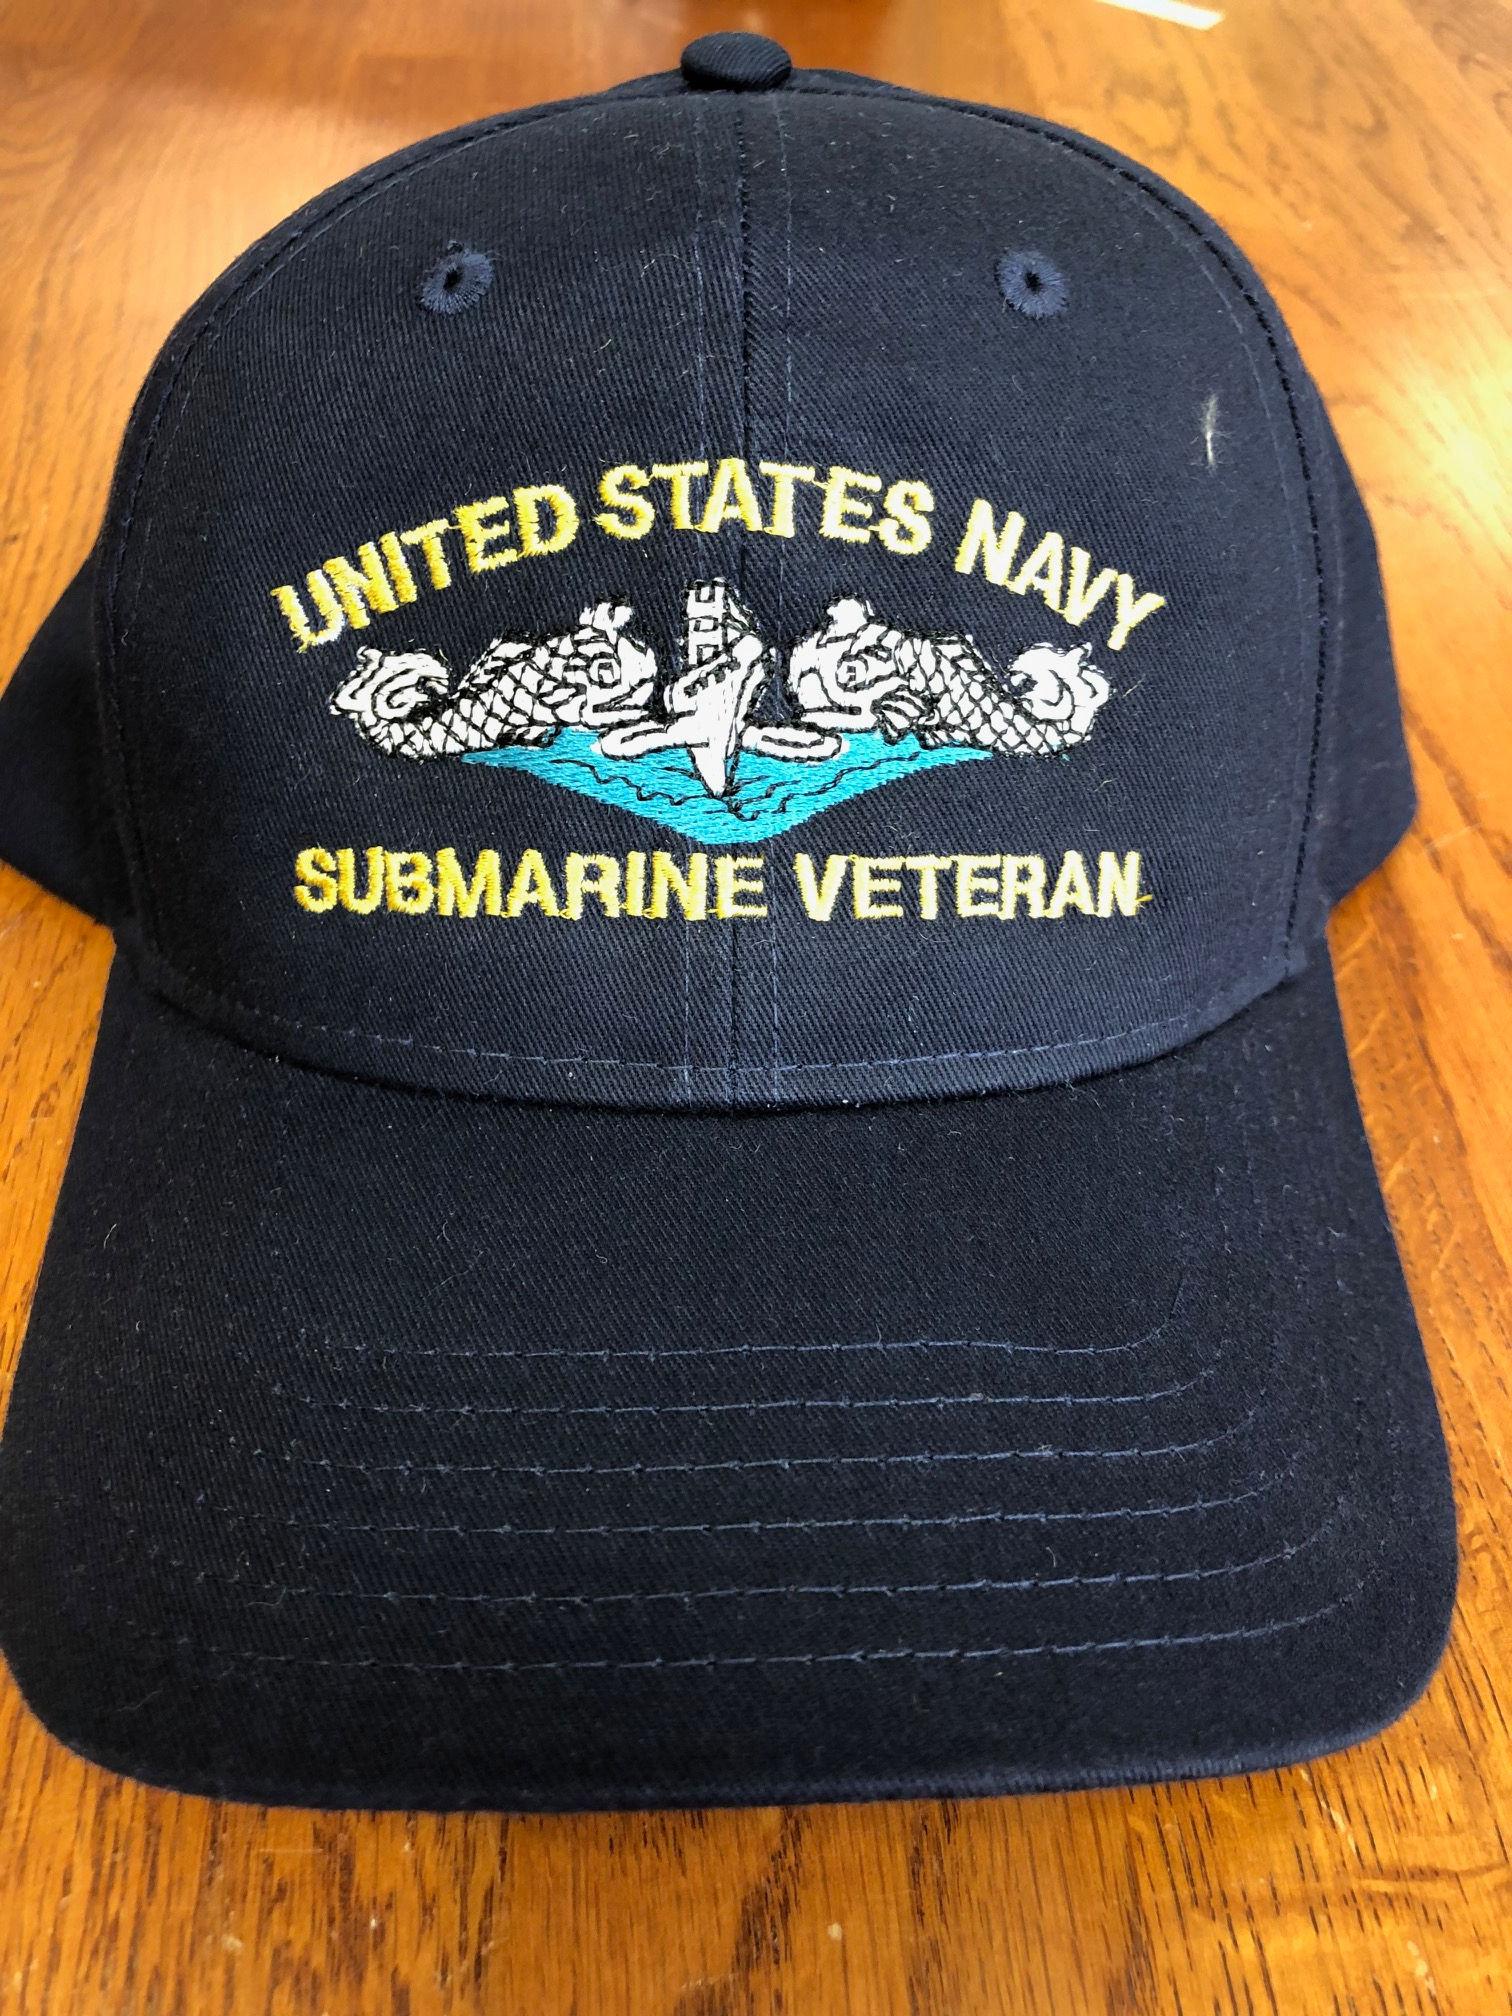 Ballcap, United States Navy Submarine Veteran